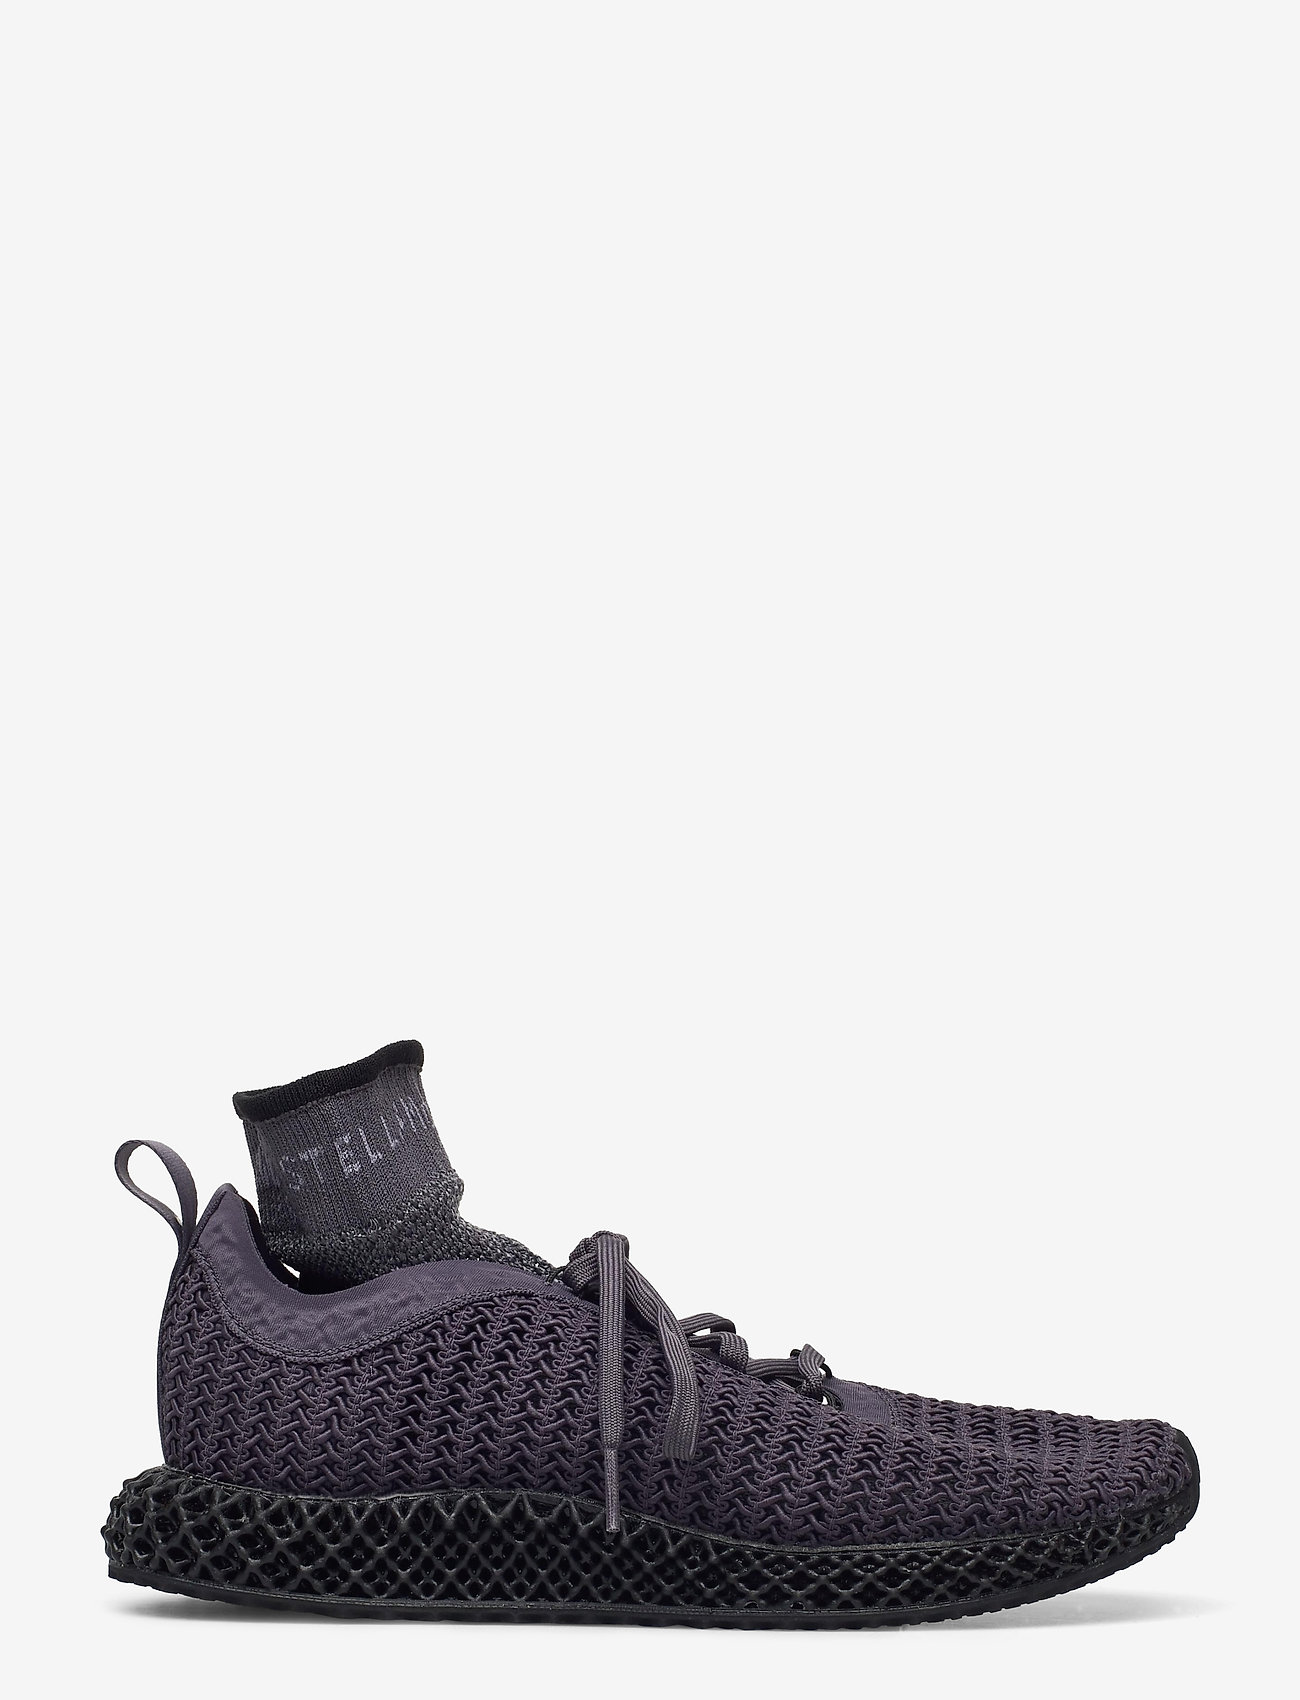 adidas by Stella McCartney - ALPHAEDGE 4D - running shoes - ngtste/cblack/plamau - 1